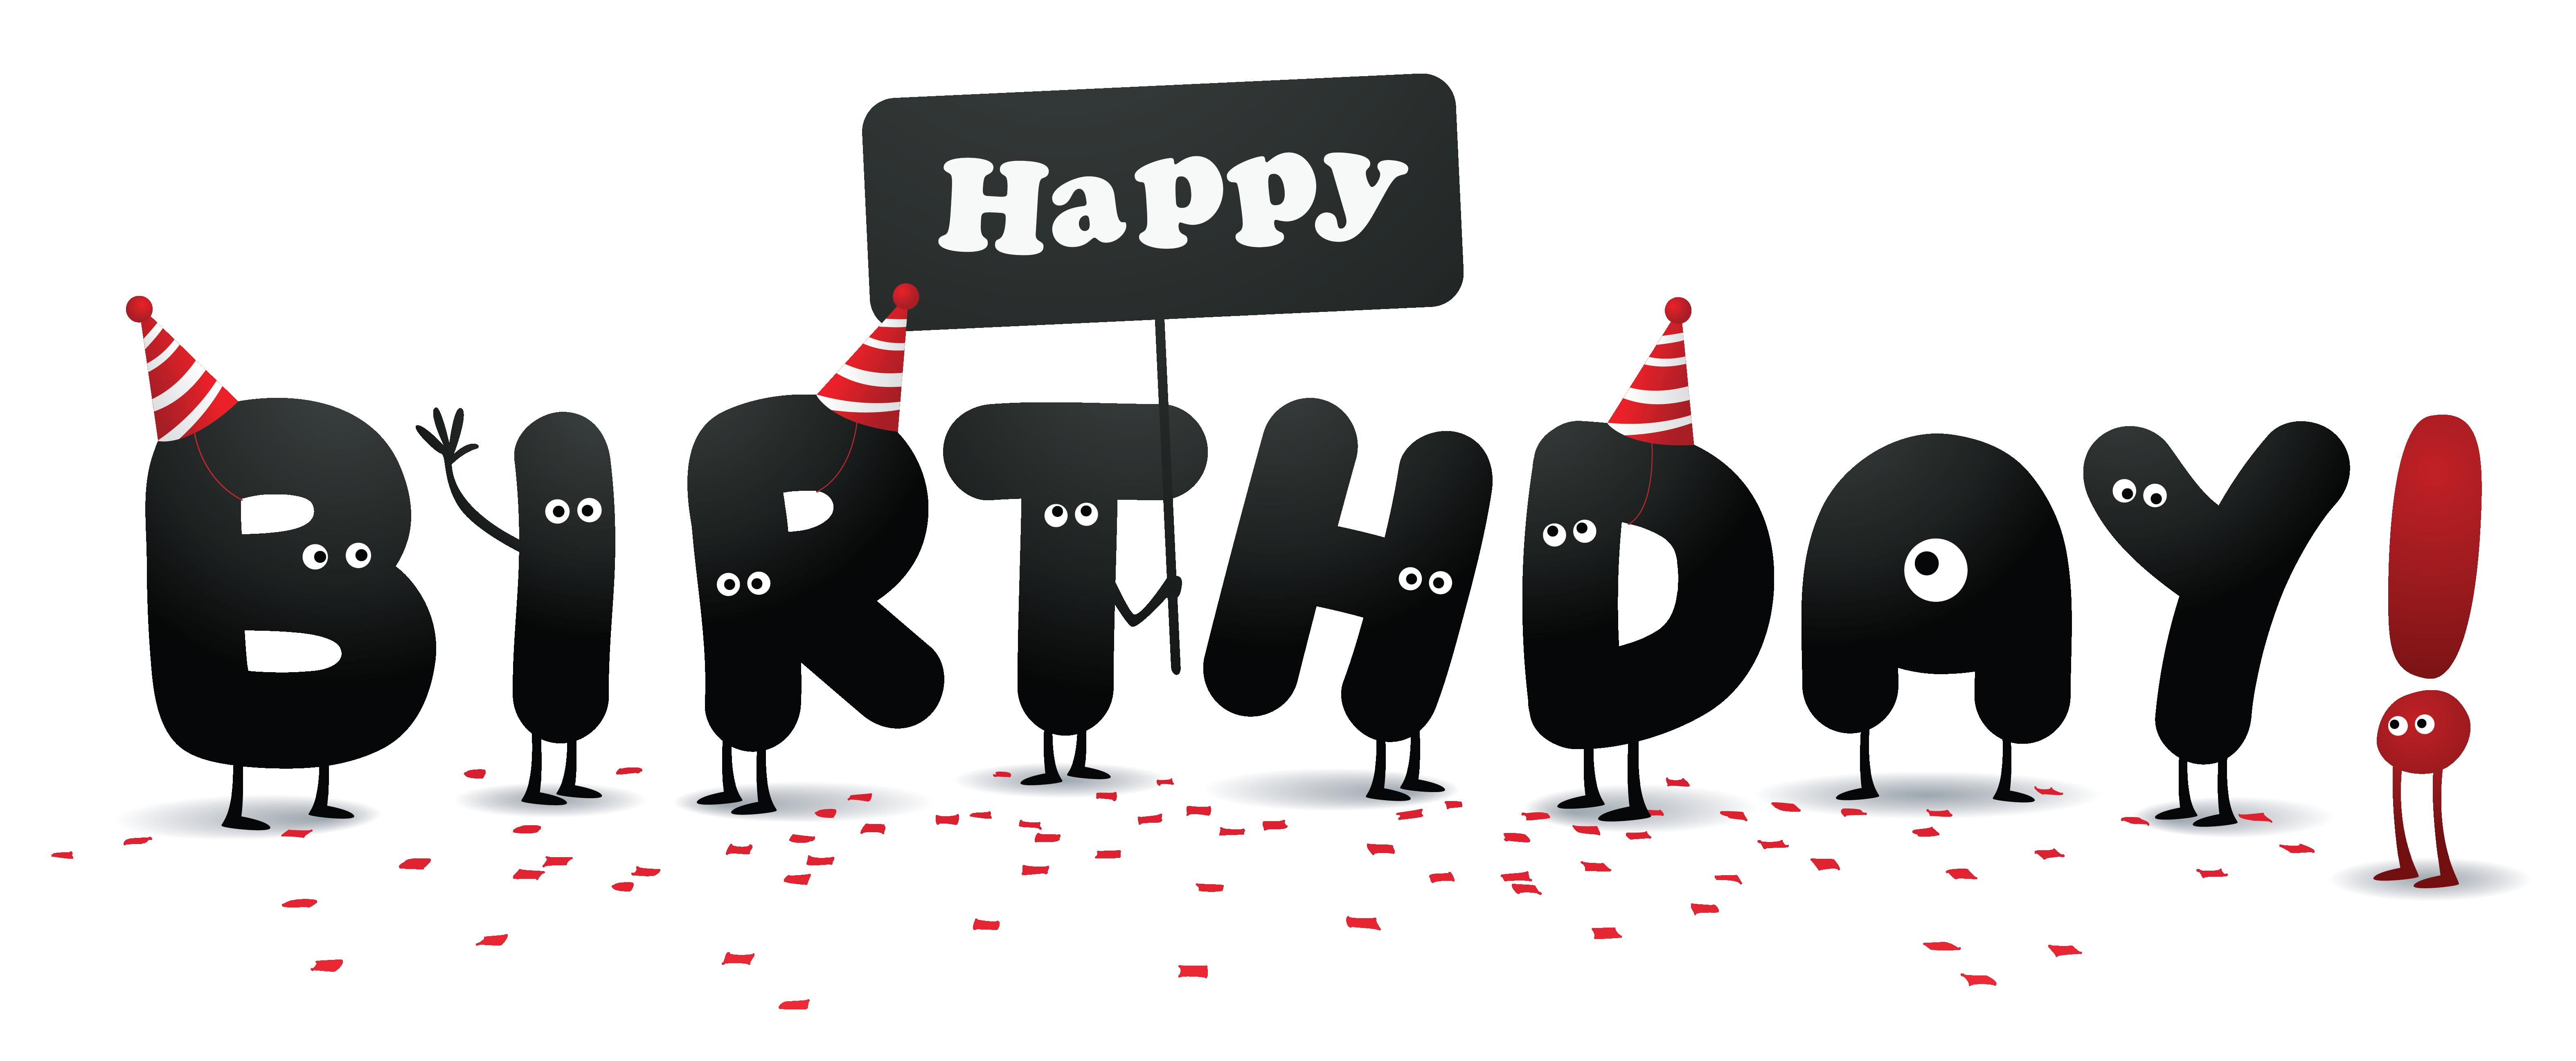 Free Happy Birthday PNG HD Graphics - 138436